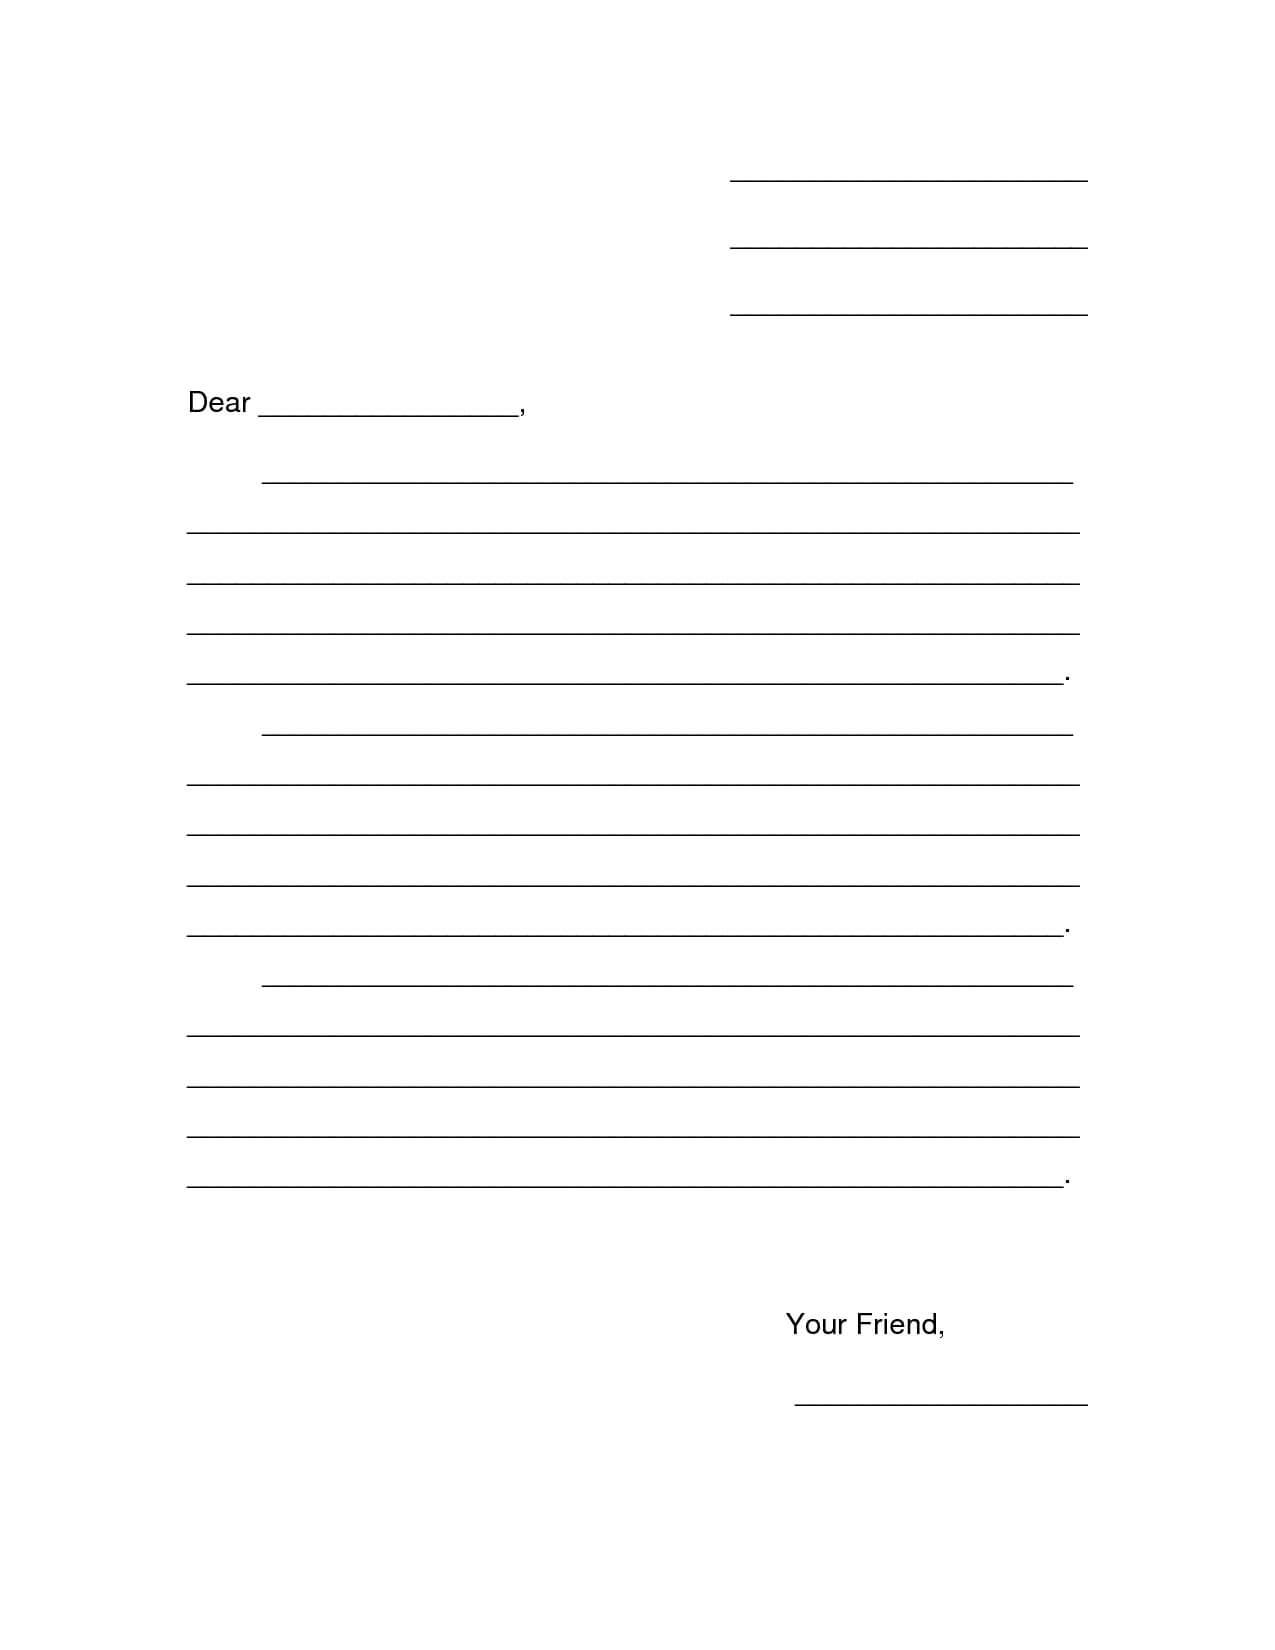 Friendly Letter Template Pdf ] – Free Friendly Letter Regarding Blank Letter Writing Template For Kids